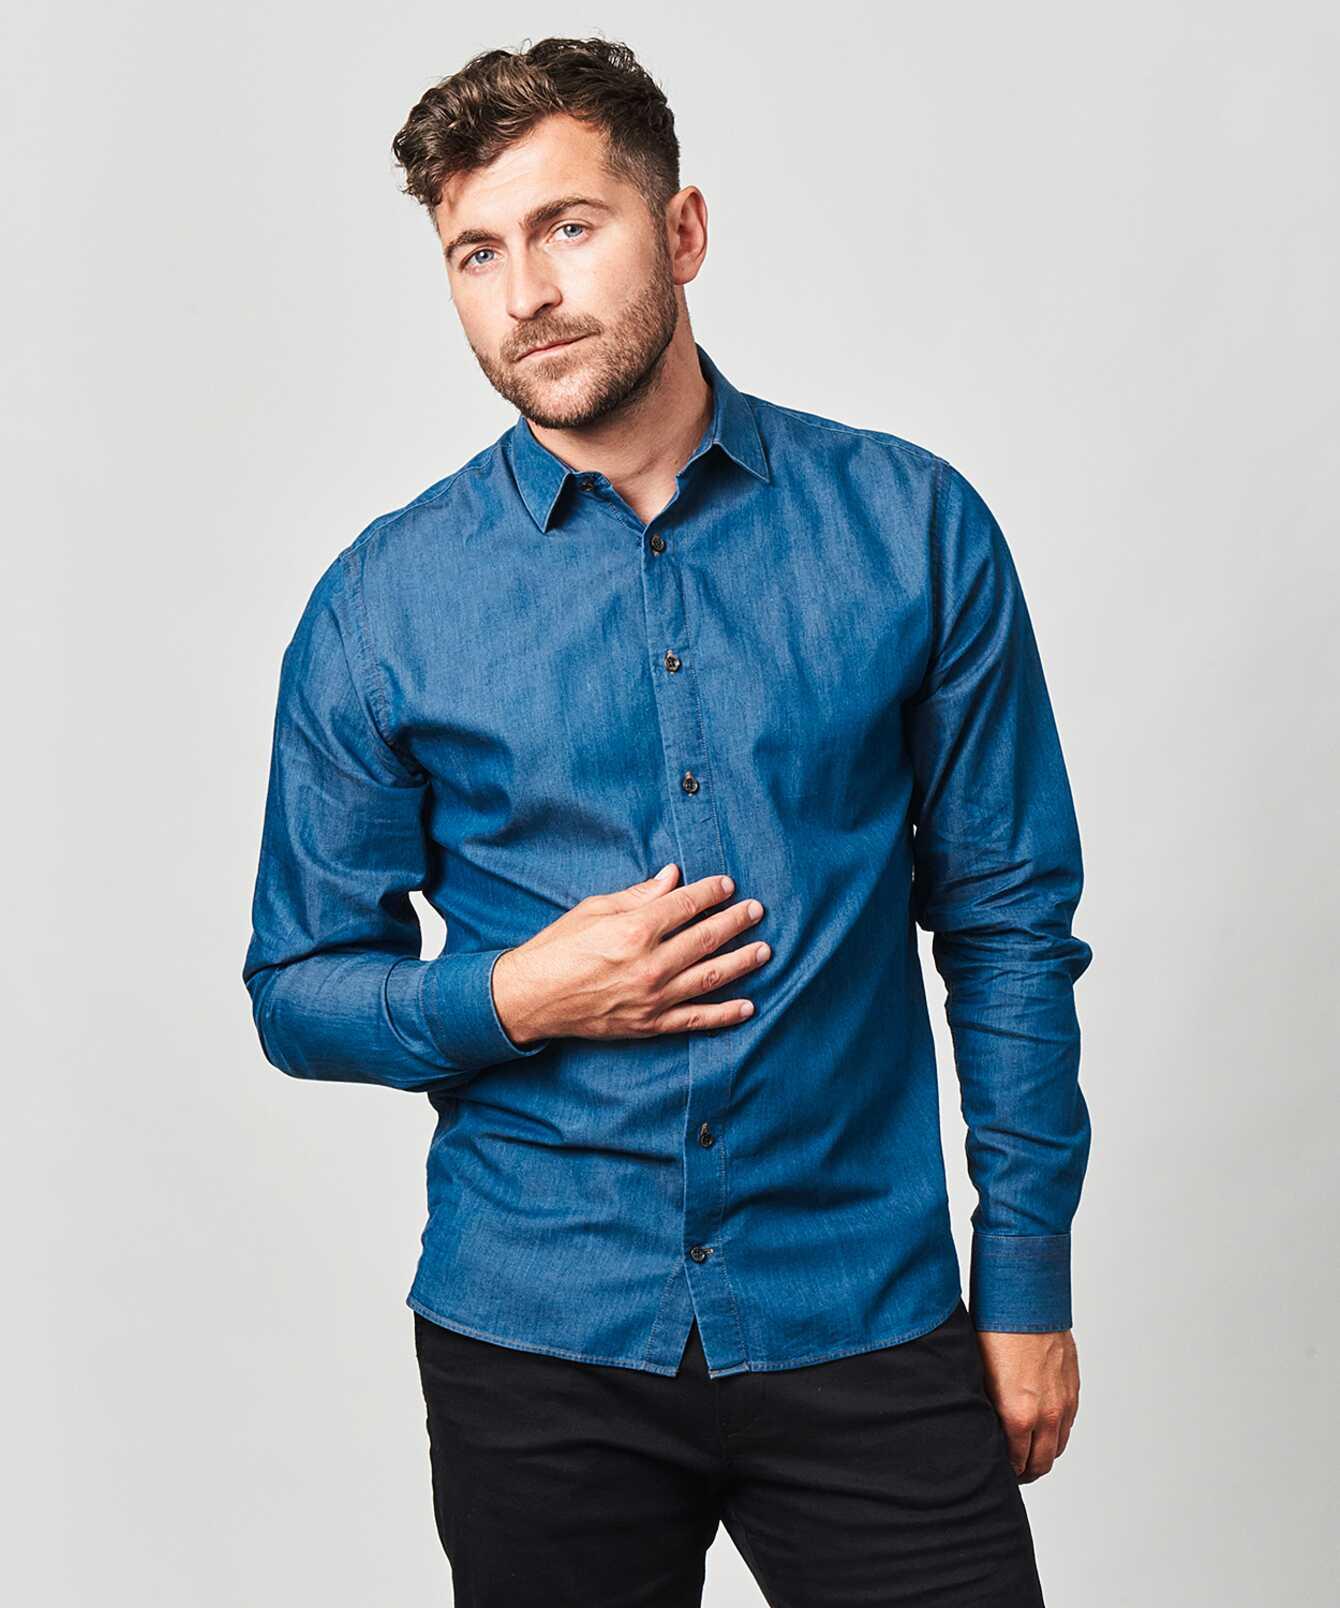 Shirt Brillo Jeans Shirt Dark Details Ex Long The Shirt Factory